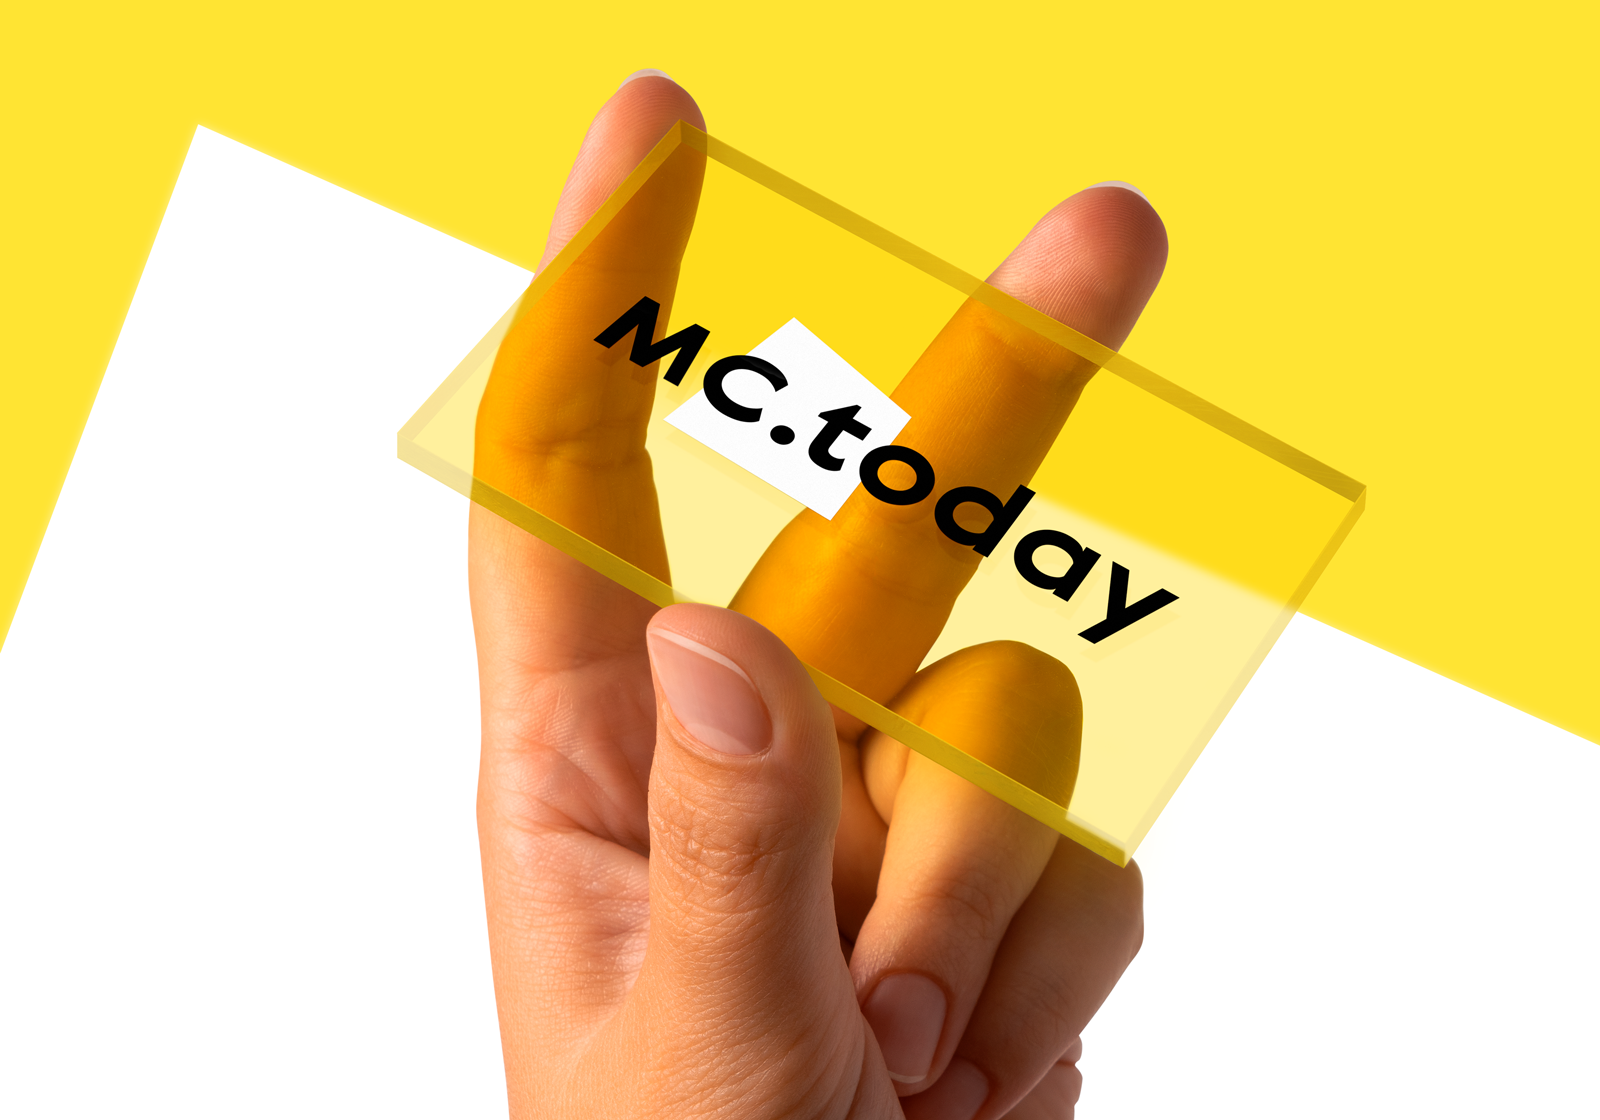 mc.today logo